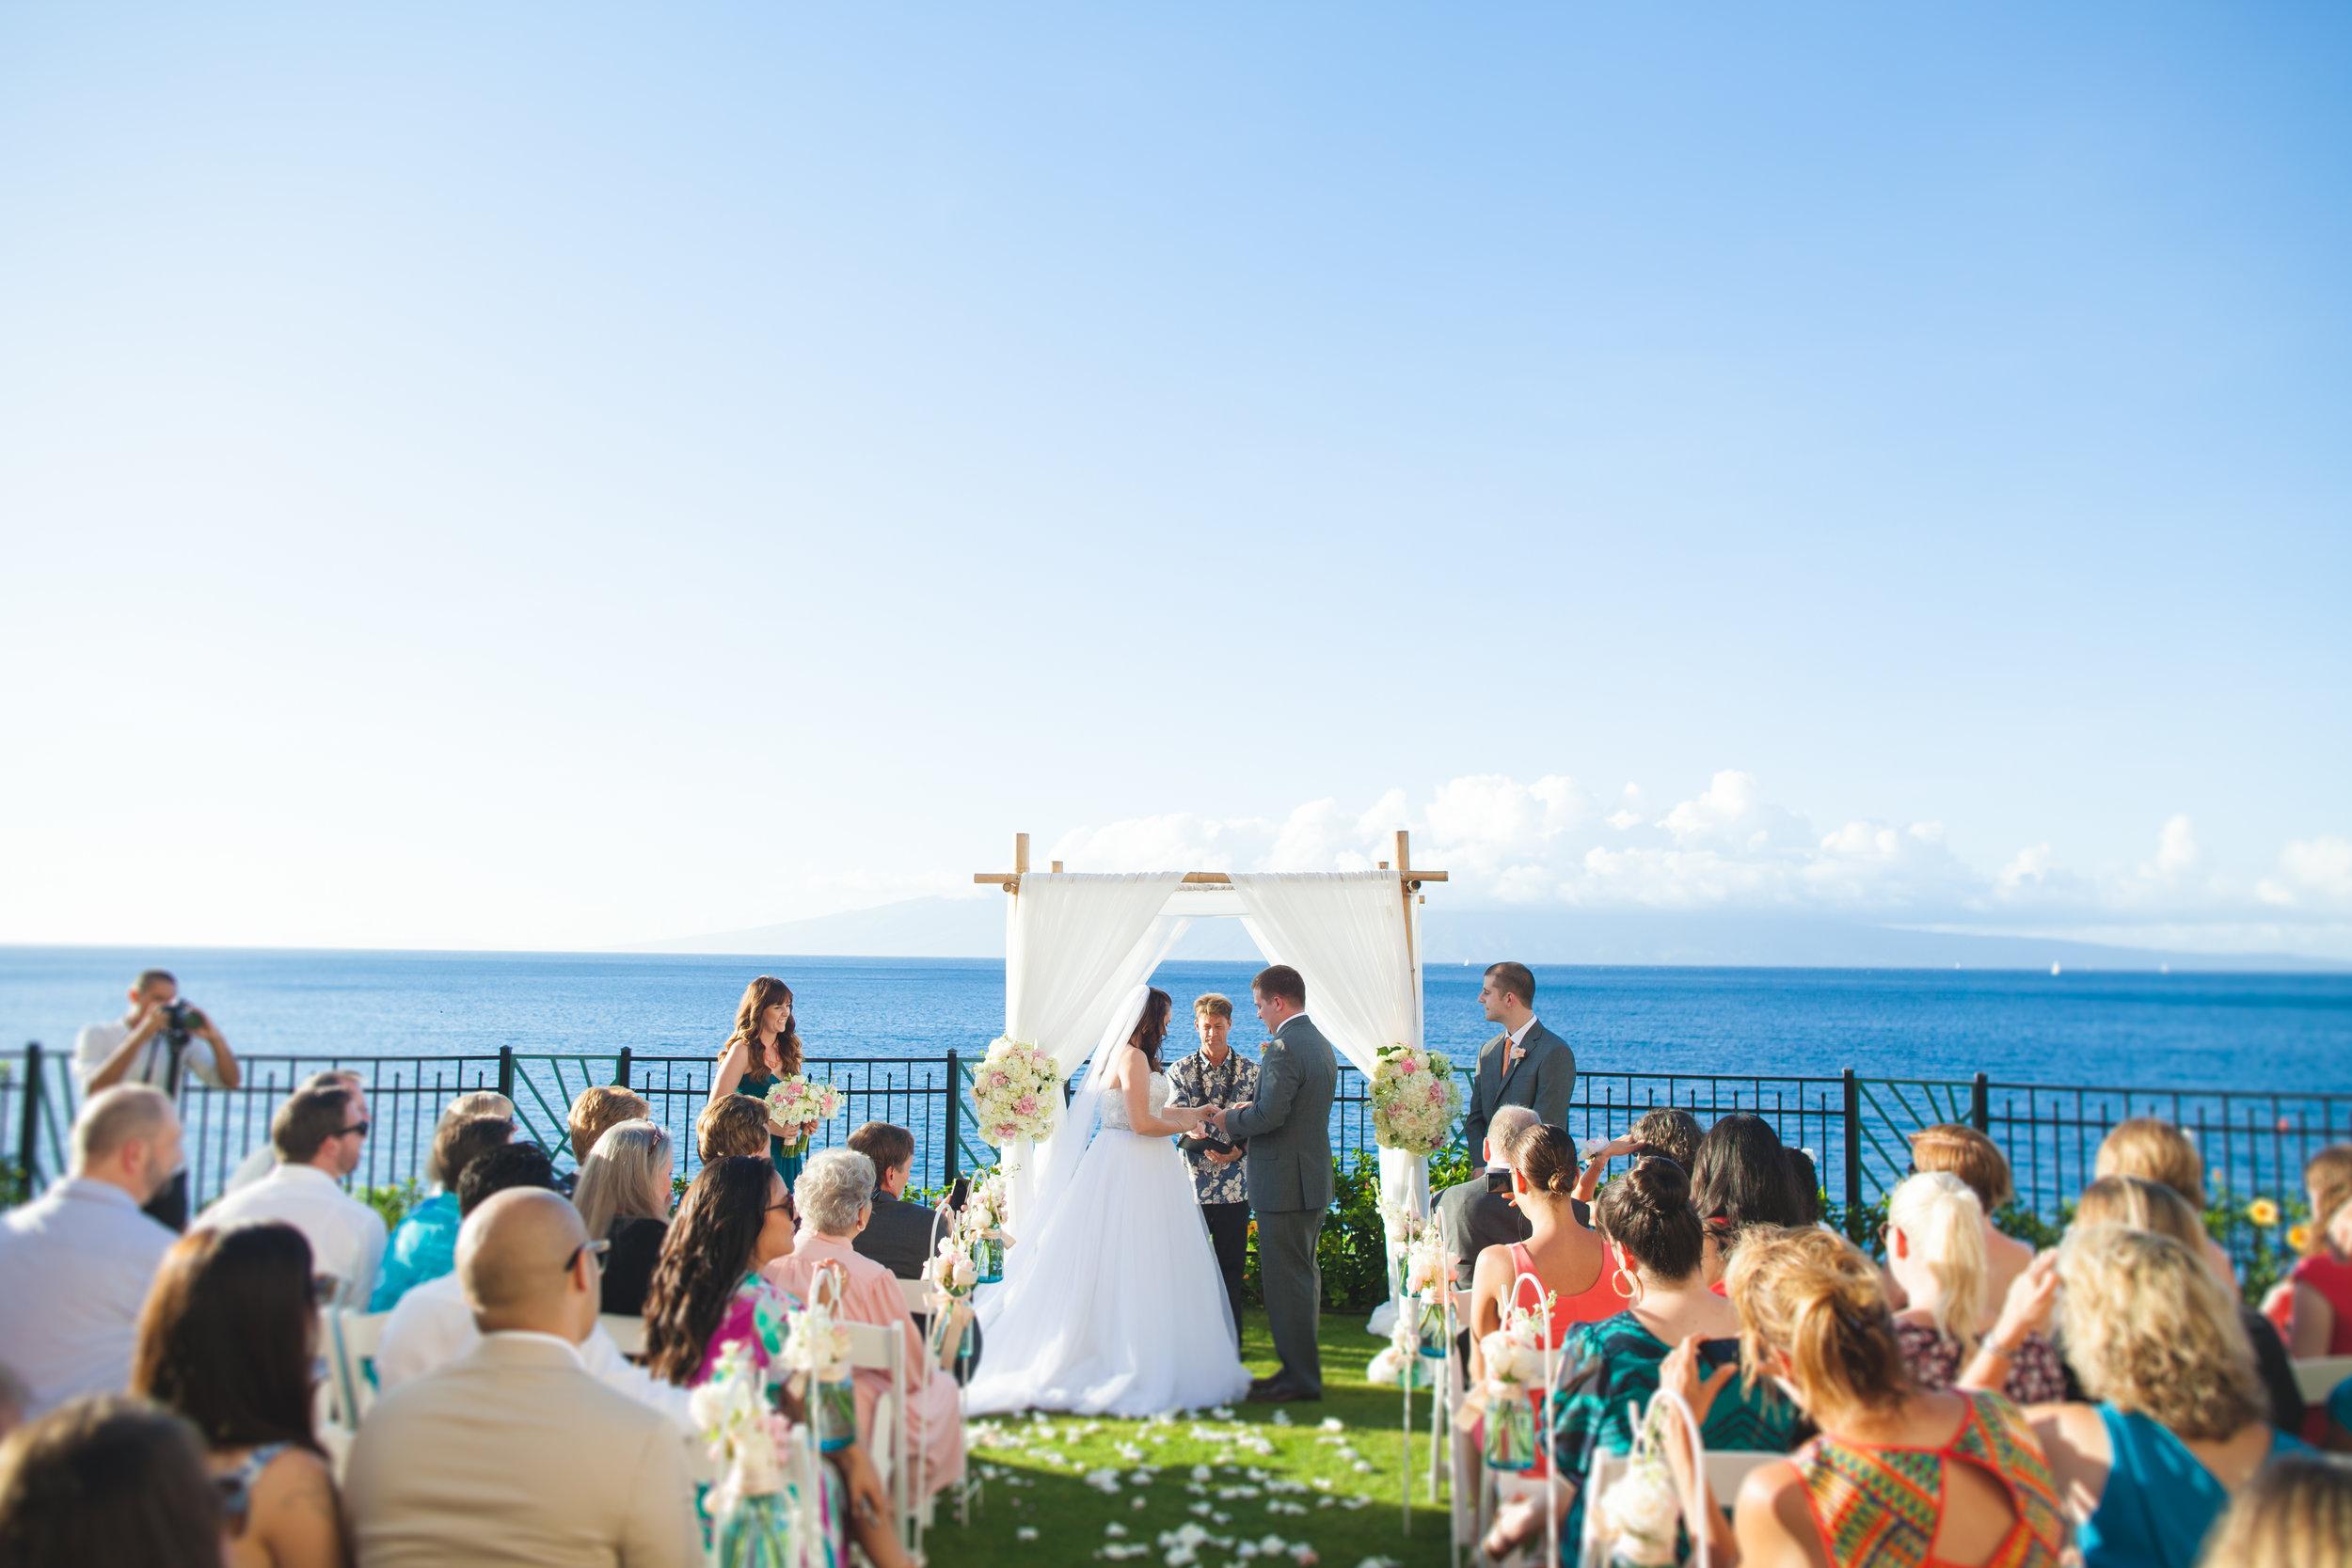 Maui, Hawaii Destination Wedding - Coastal Theme